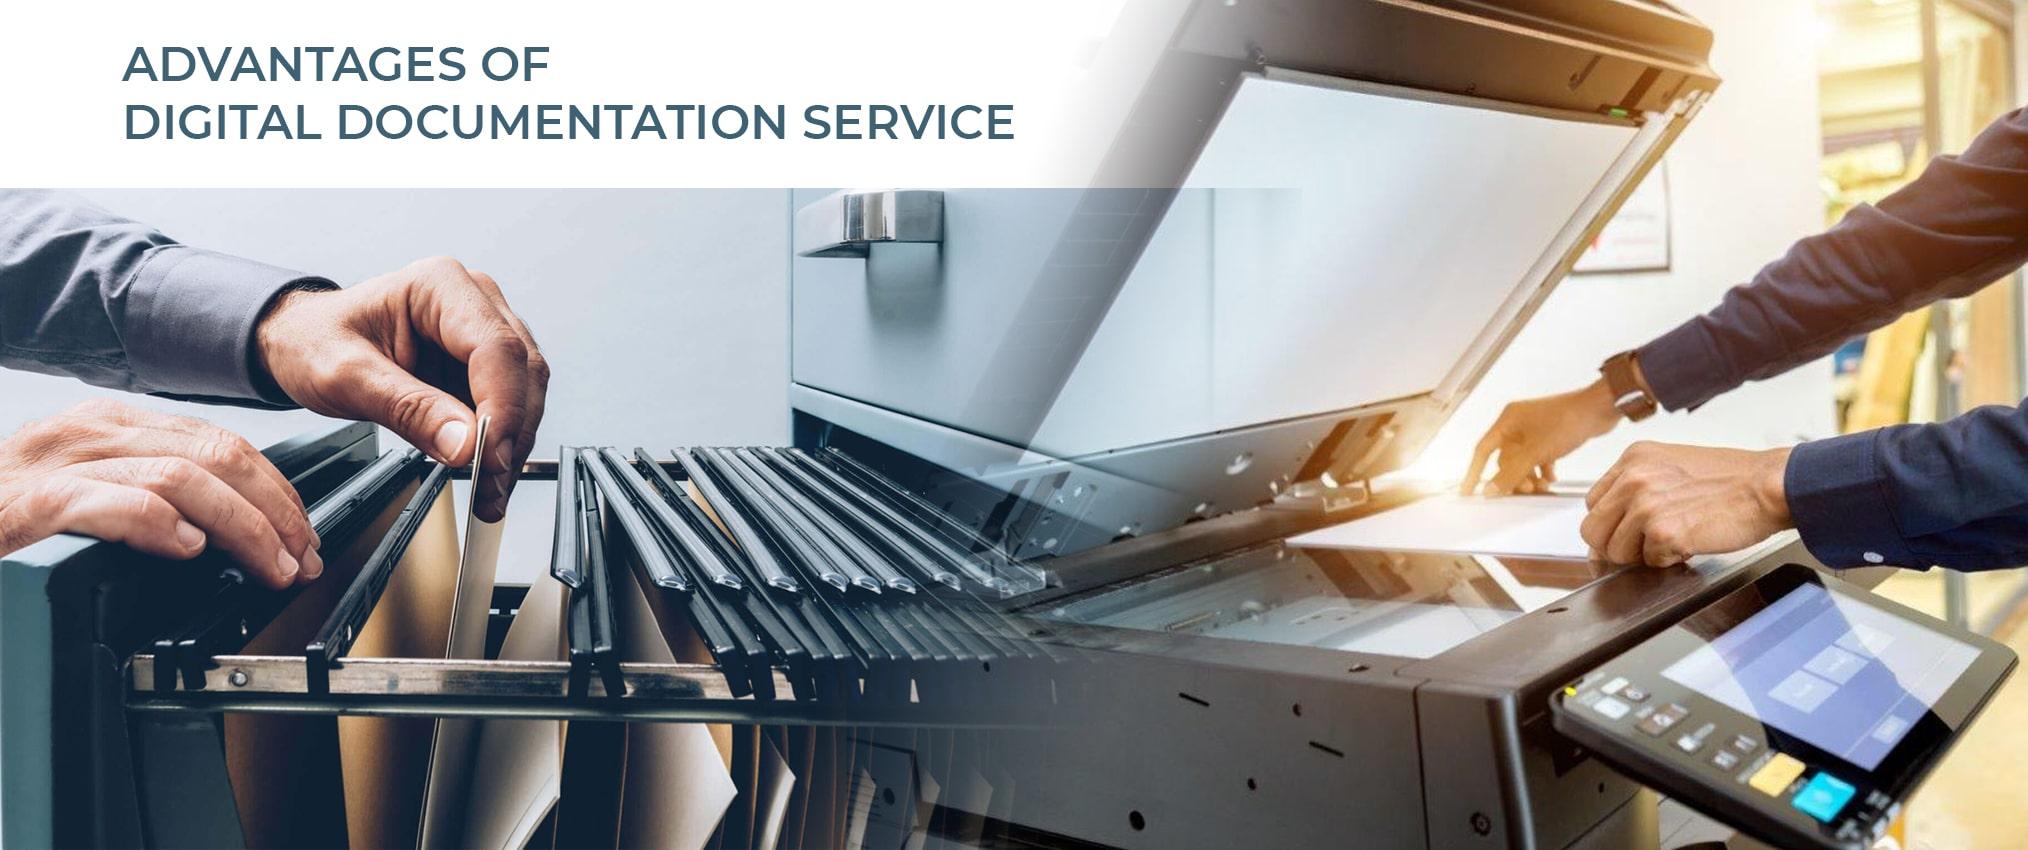 advantages of digital documentation service